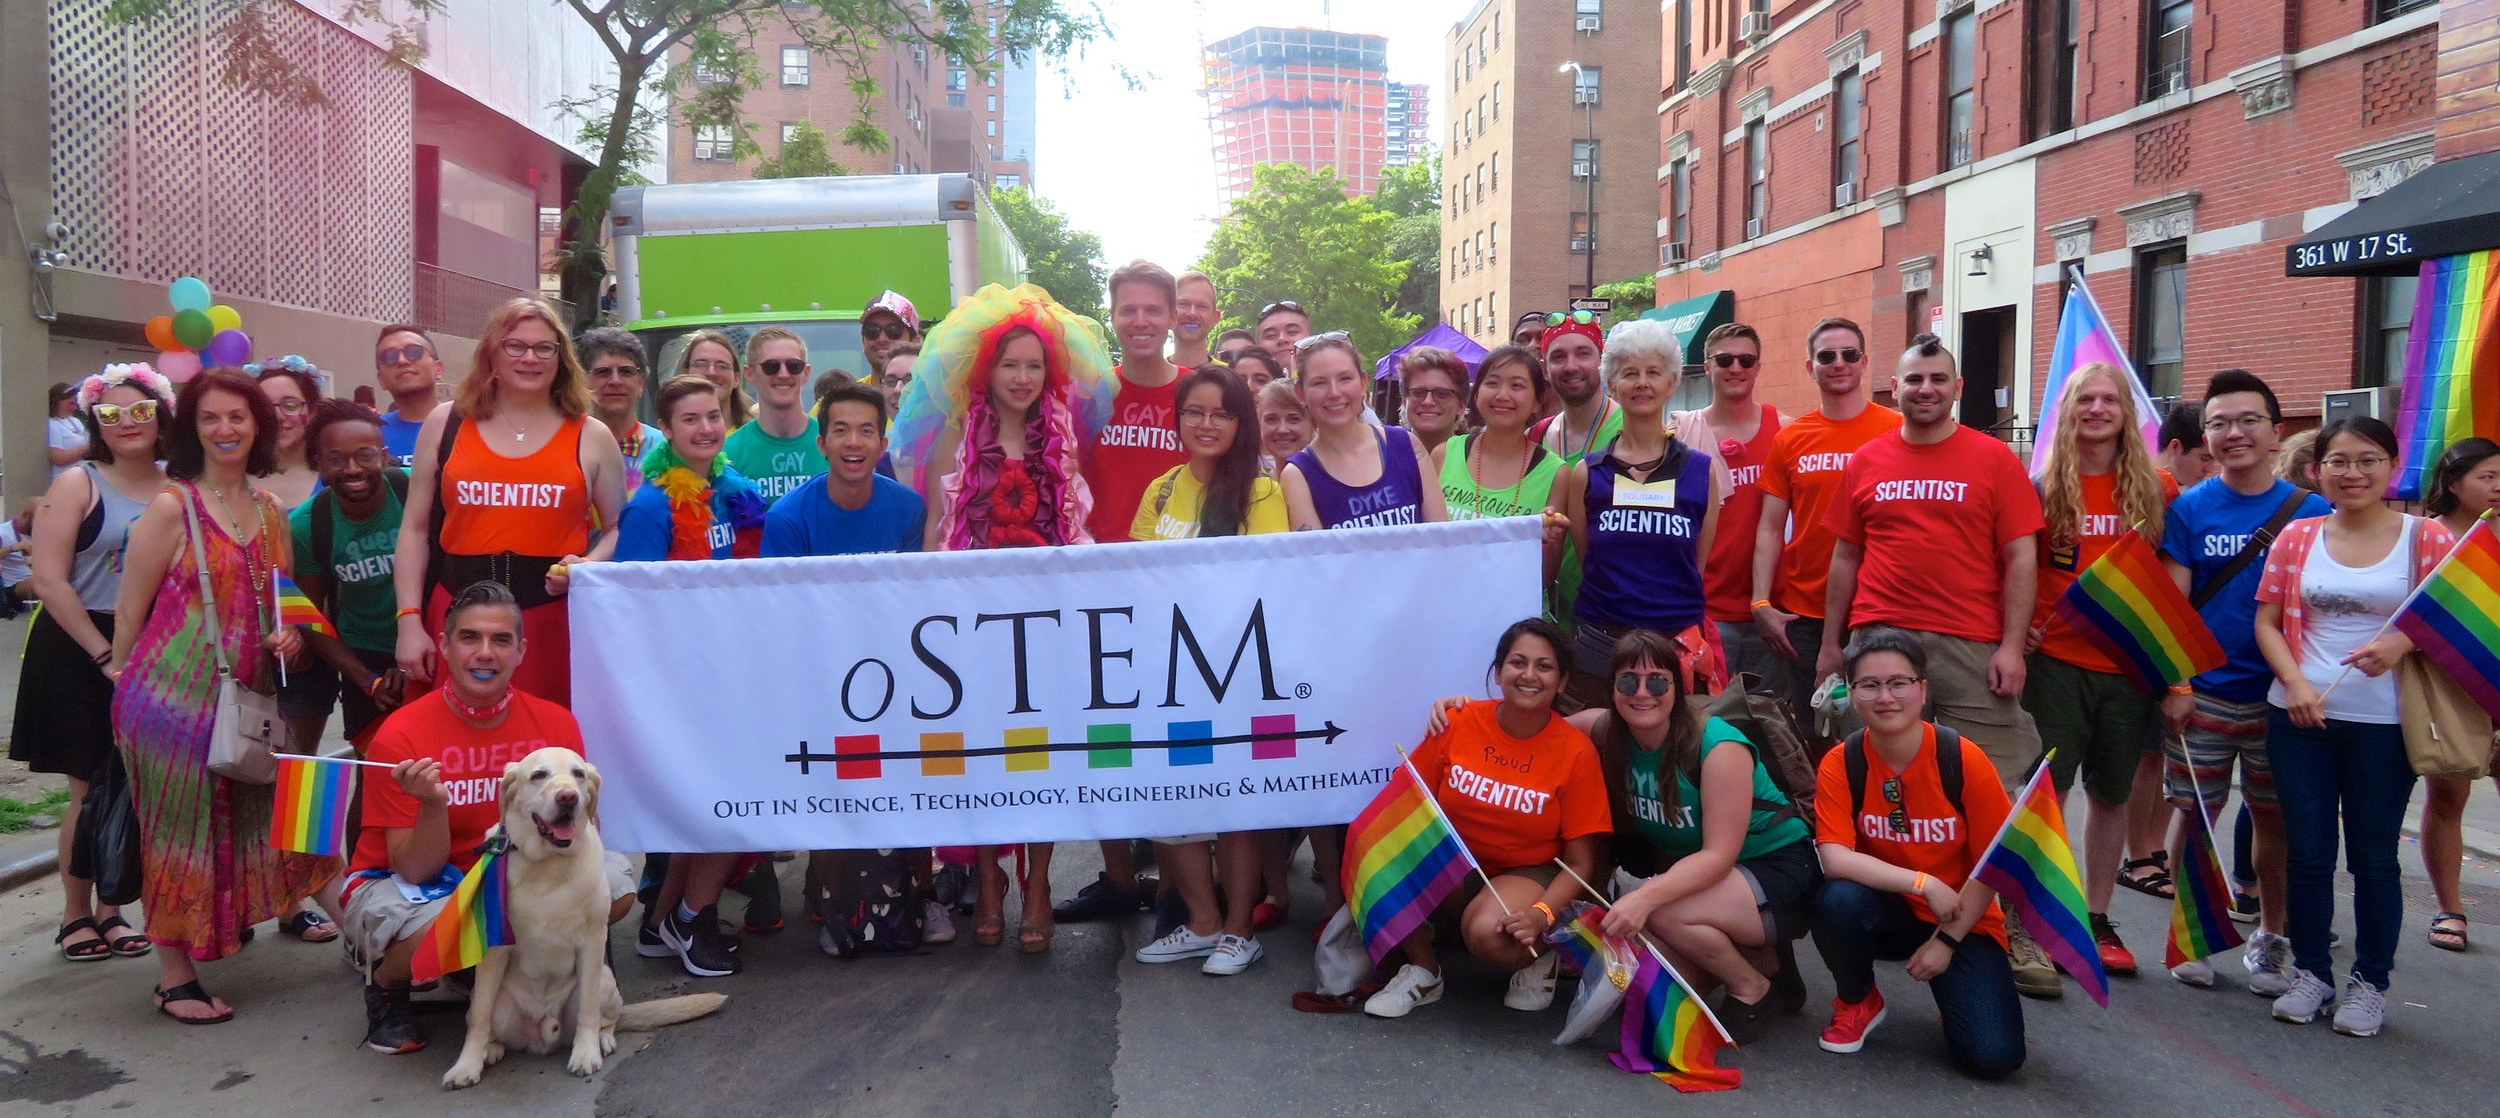 NYC_Pride_oSTEM.JPG